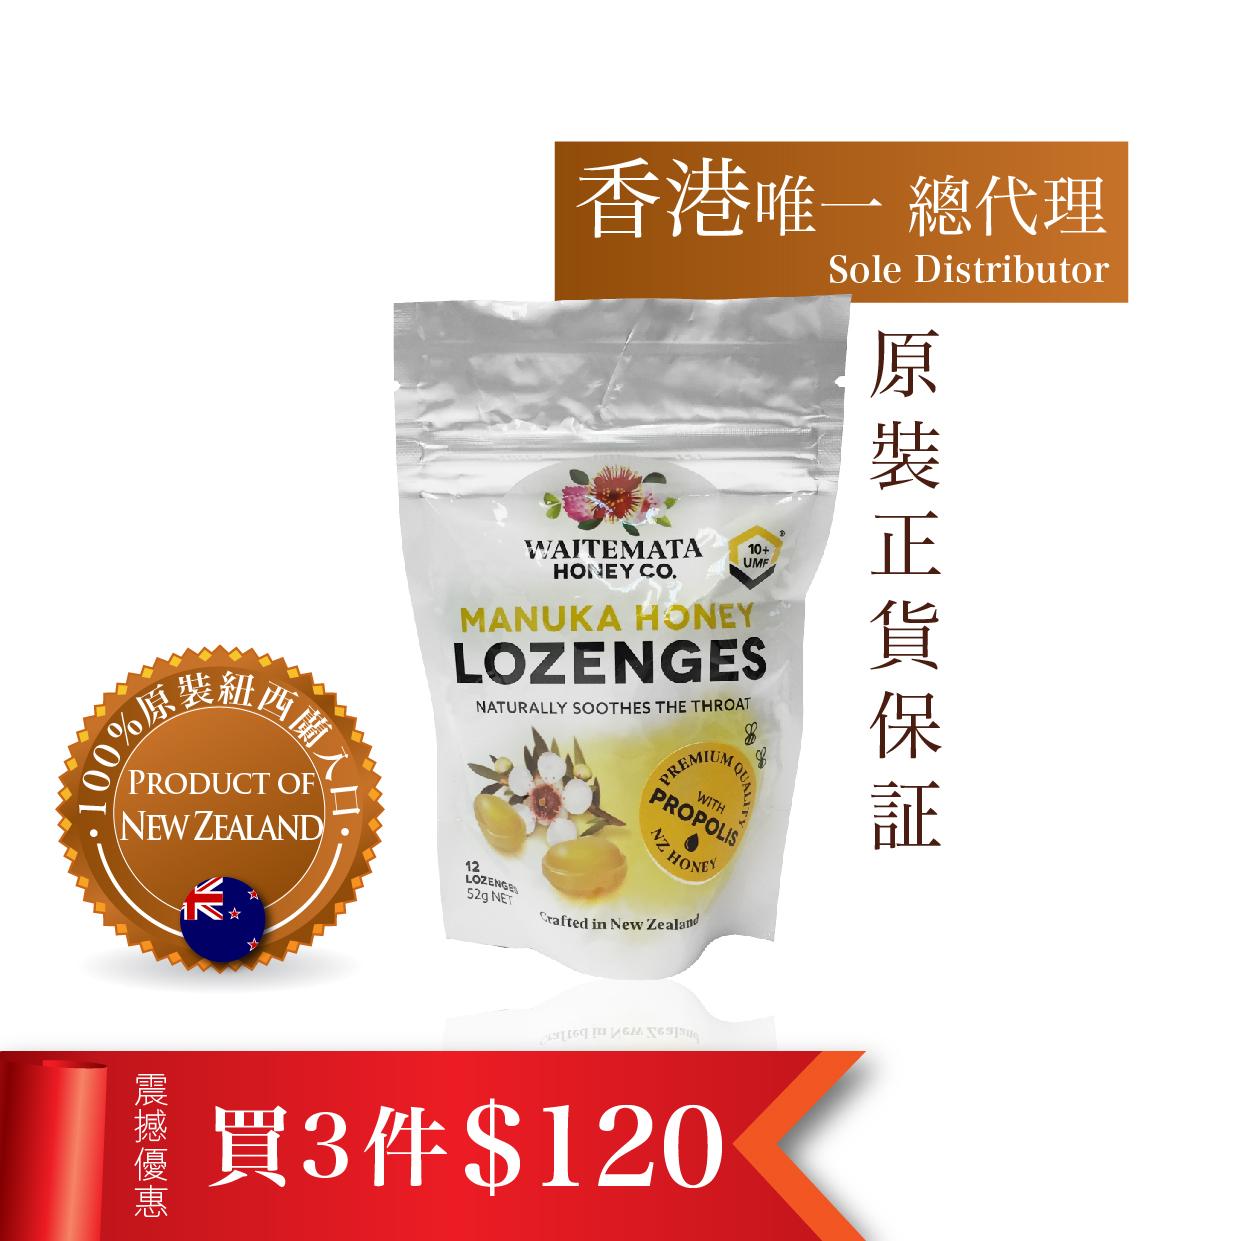 WIATEMATA Honey Propolis Lozenges